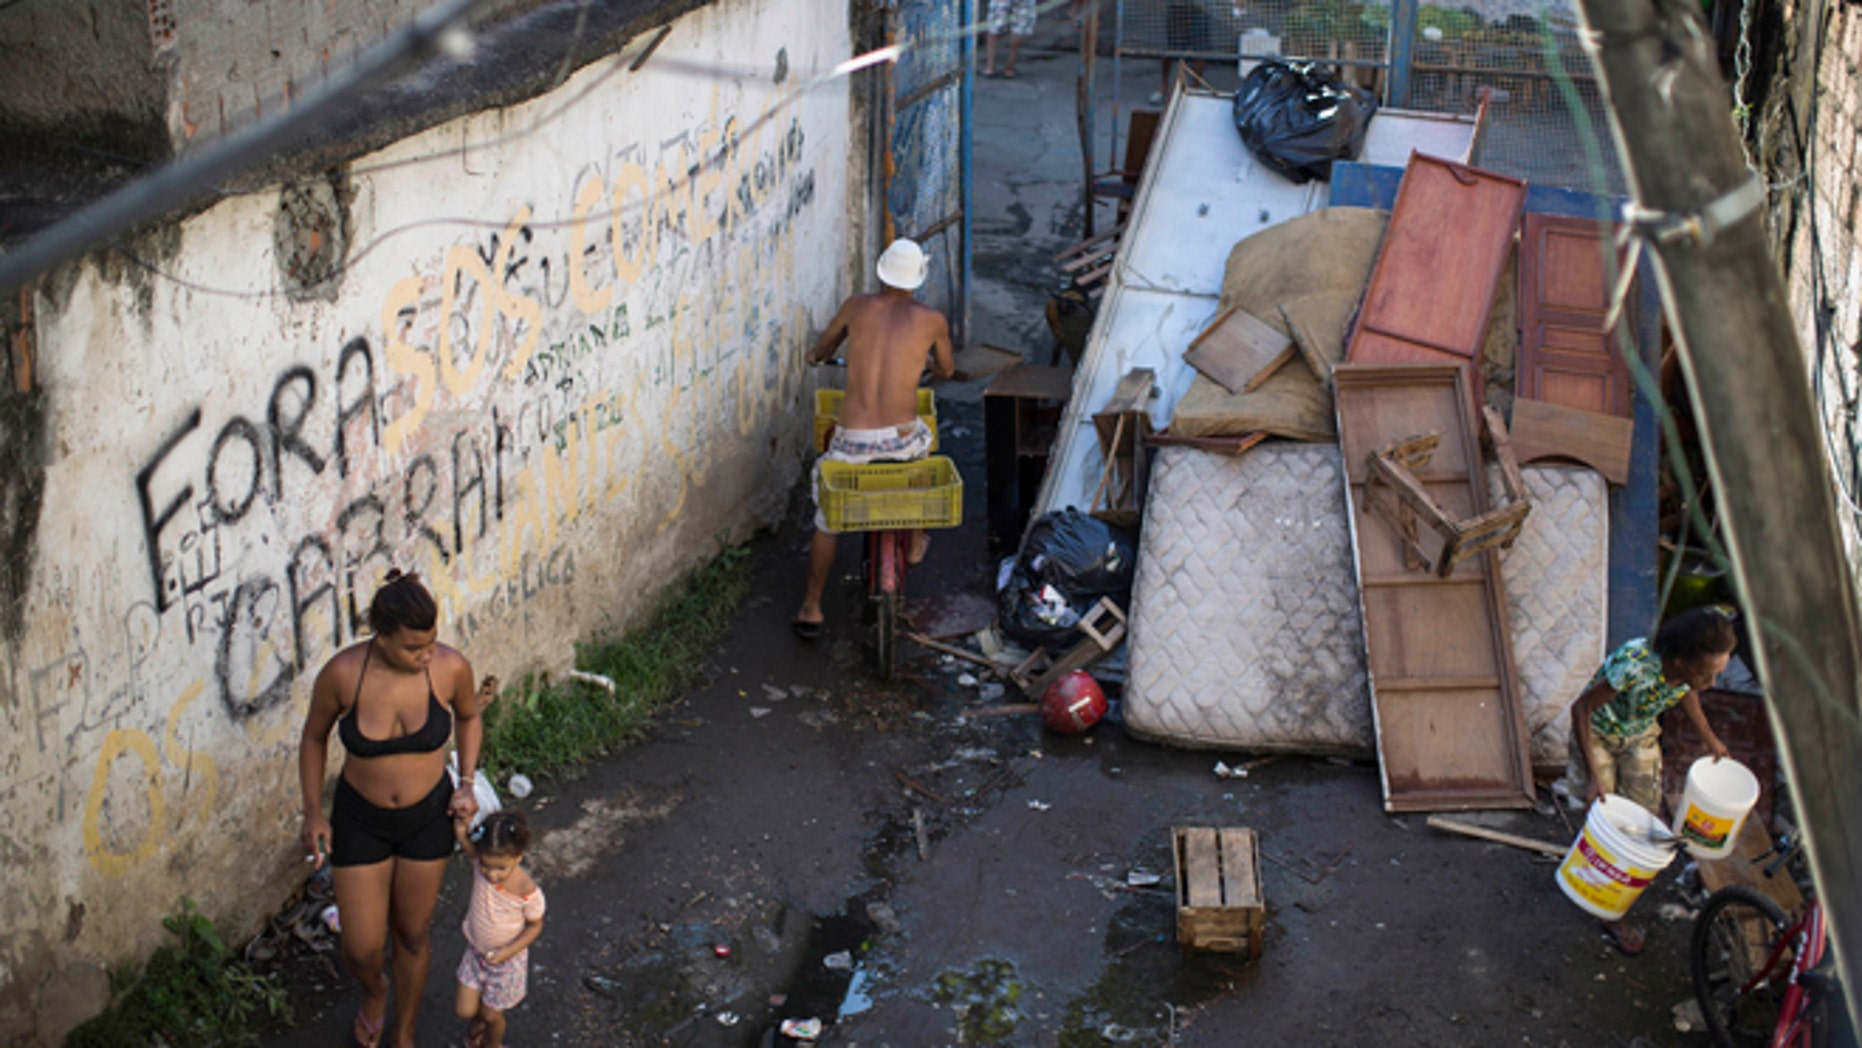 Residents walk inside the Favela do Metro slum near Maracana stadium, on Jan. 9, 2014.